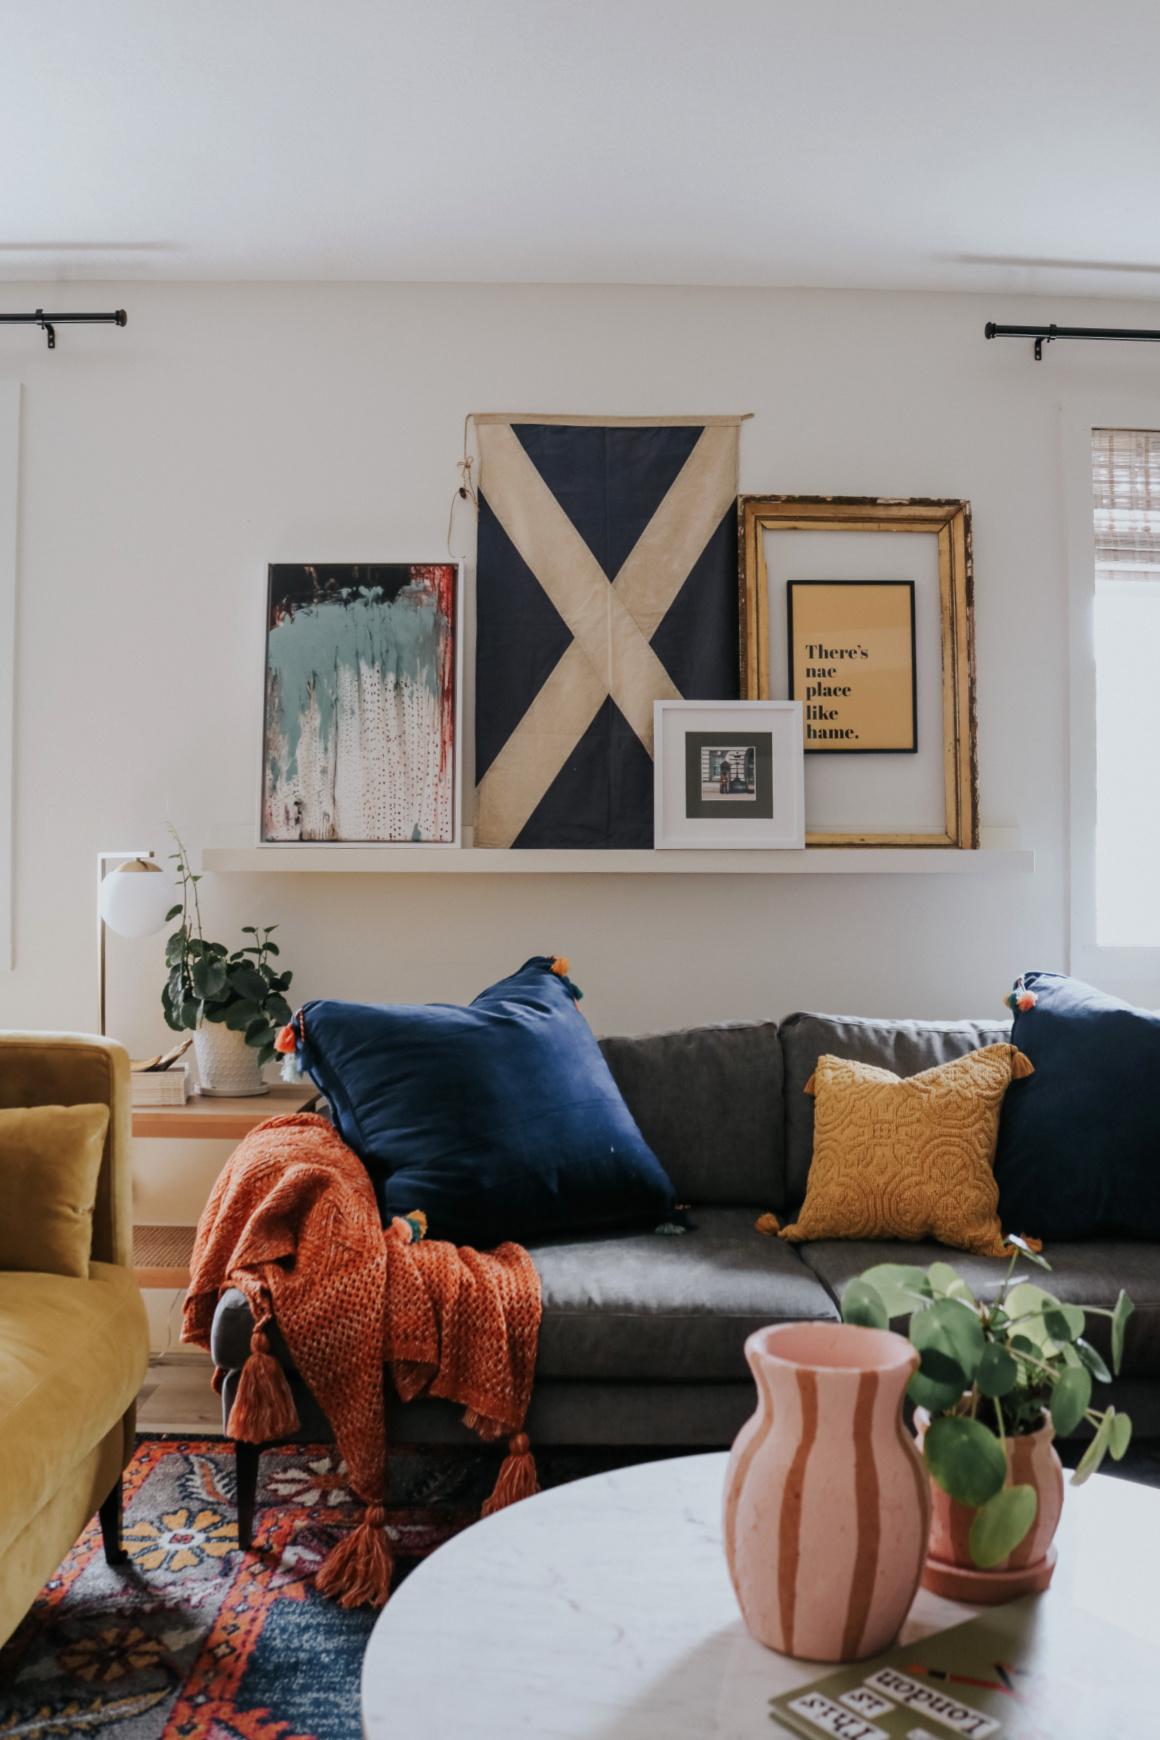 Colorful Fun Family Room- Vintage Inspired Velvet Sofa Picture ledge Colorful family room Photo ledge Gold sofa